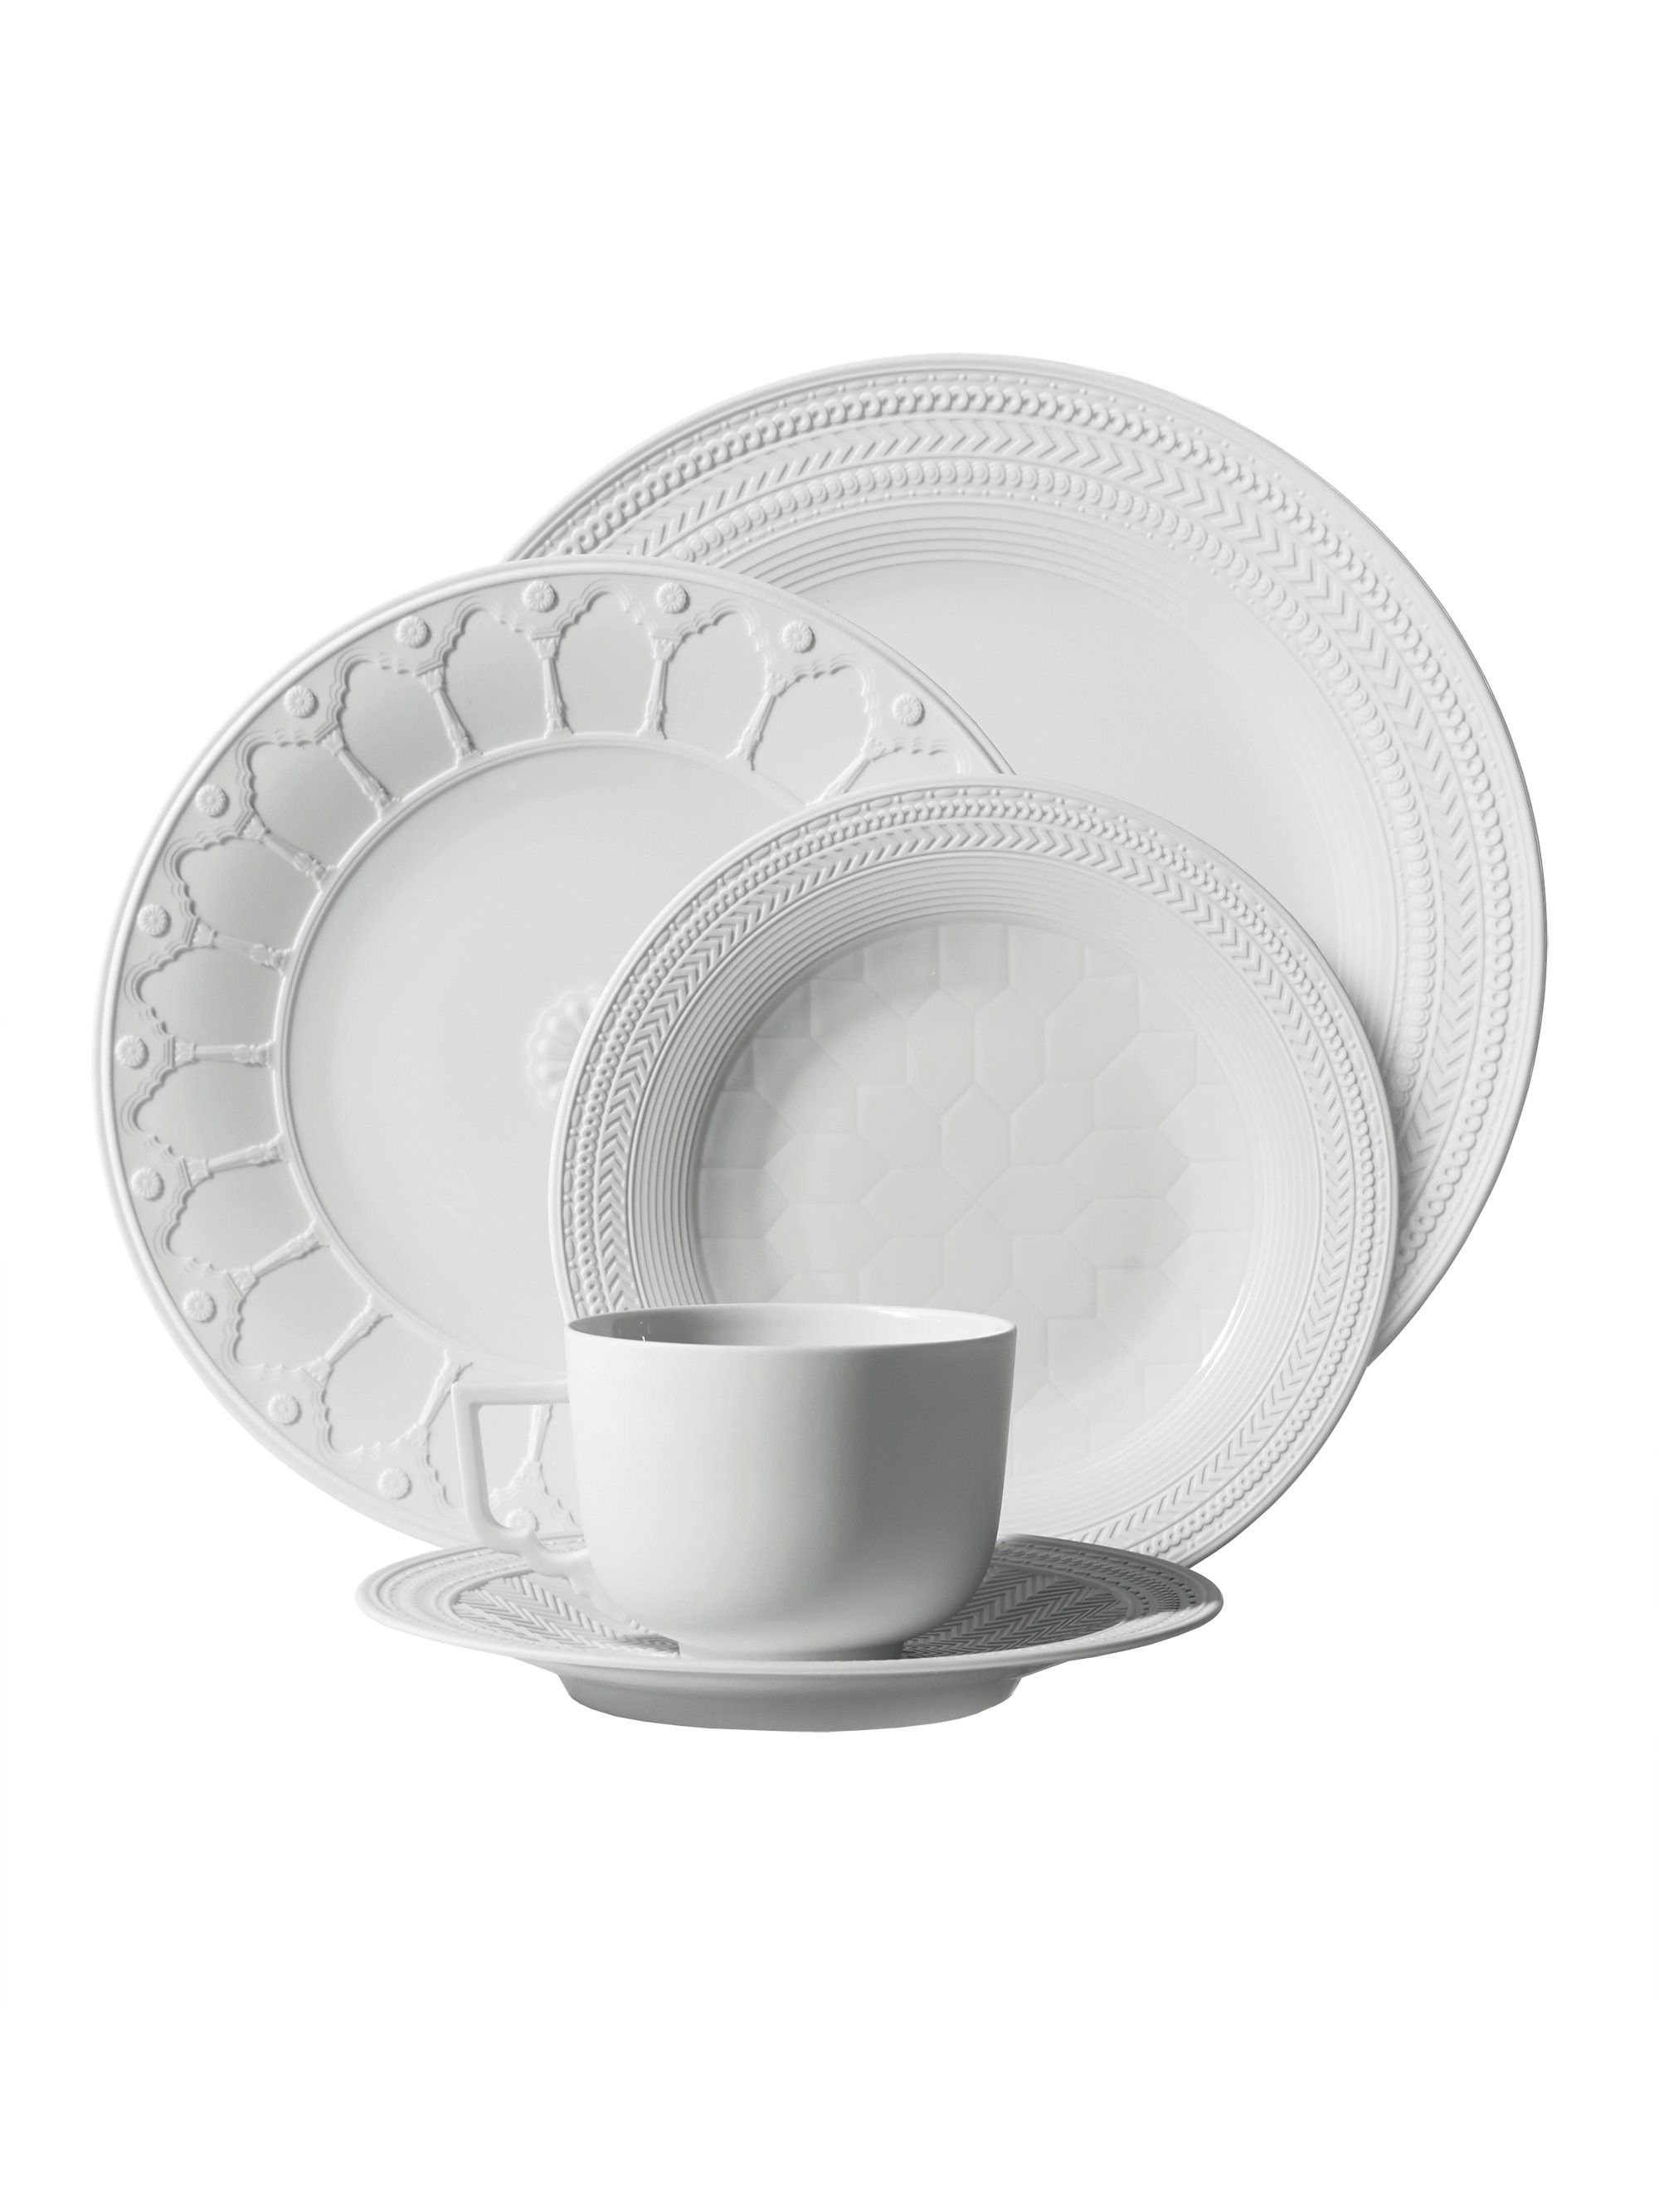 Set of 4 Michael Aram Forest Leaf Dinner Plate